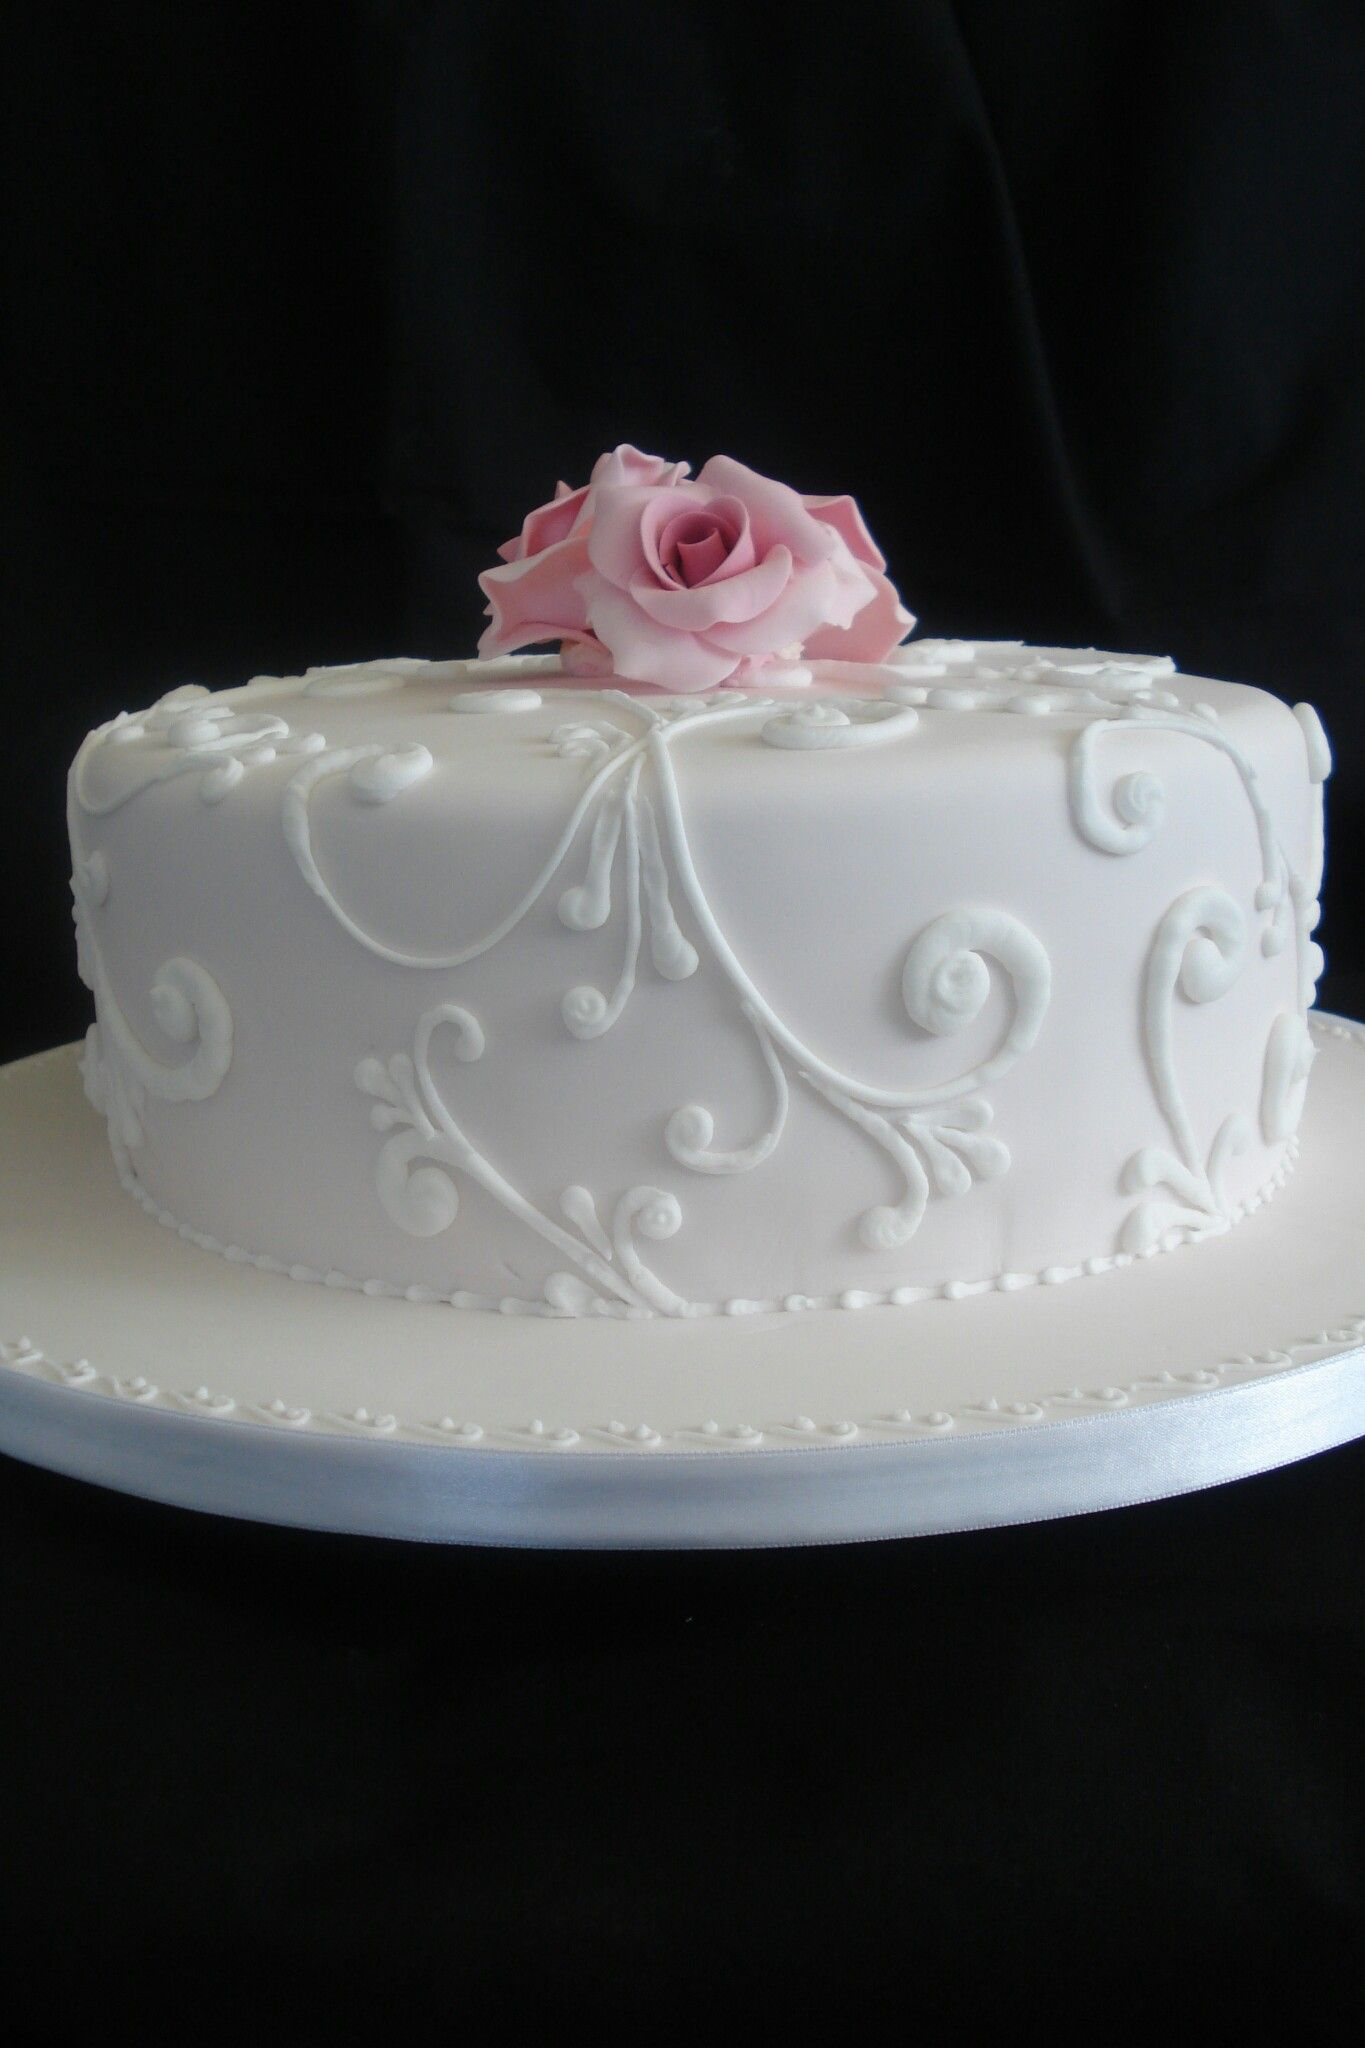 Pin by eva wohlrábová on dorty pinterest wedding cake and cake